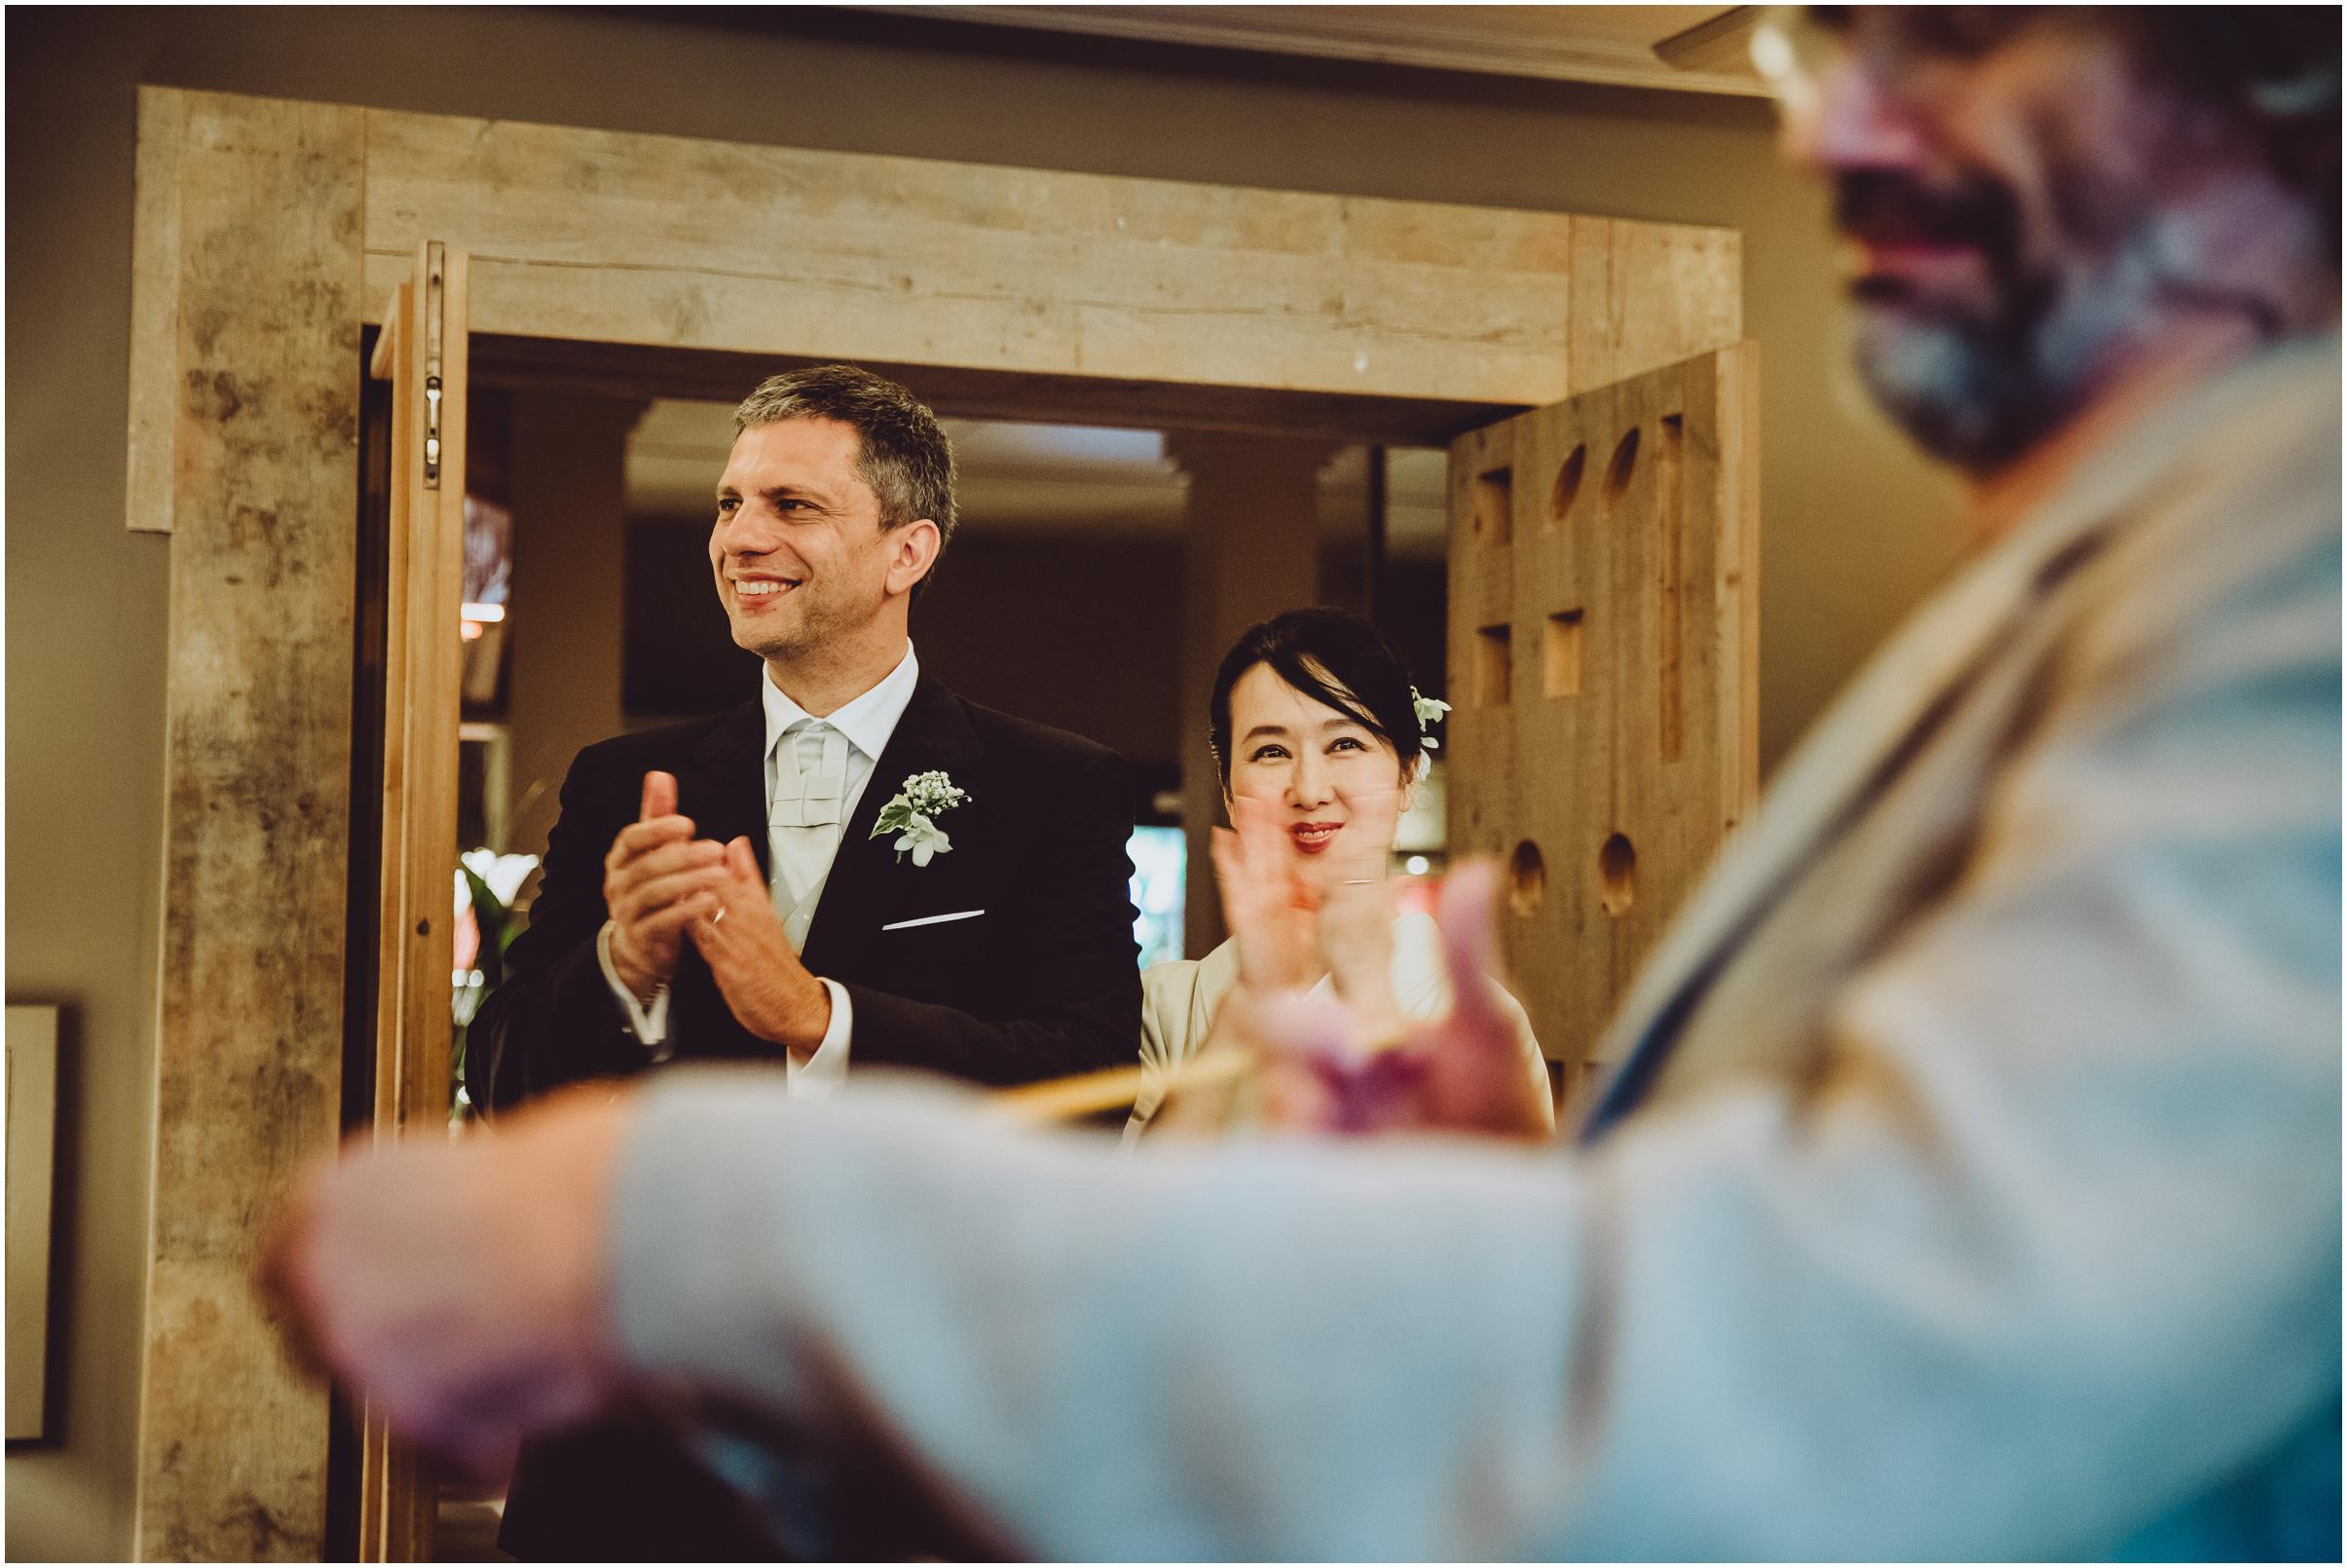 WEDDING-PHOTOGRAPHY-SARA-LORENZONI-FOTOGRAFIA-MATRIMONIO-ORVIETO-JUKA-ANTONELLO60